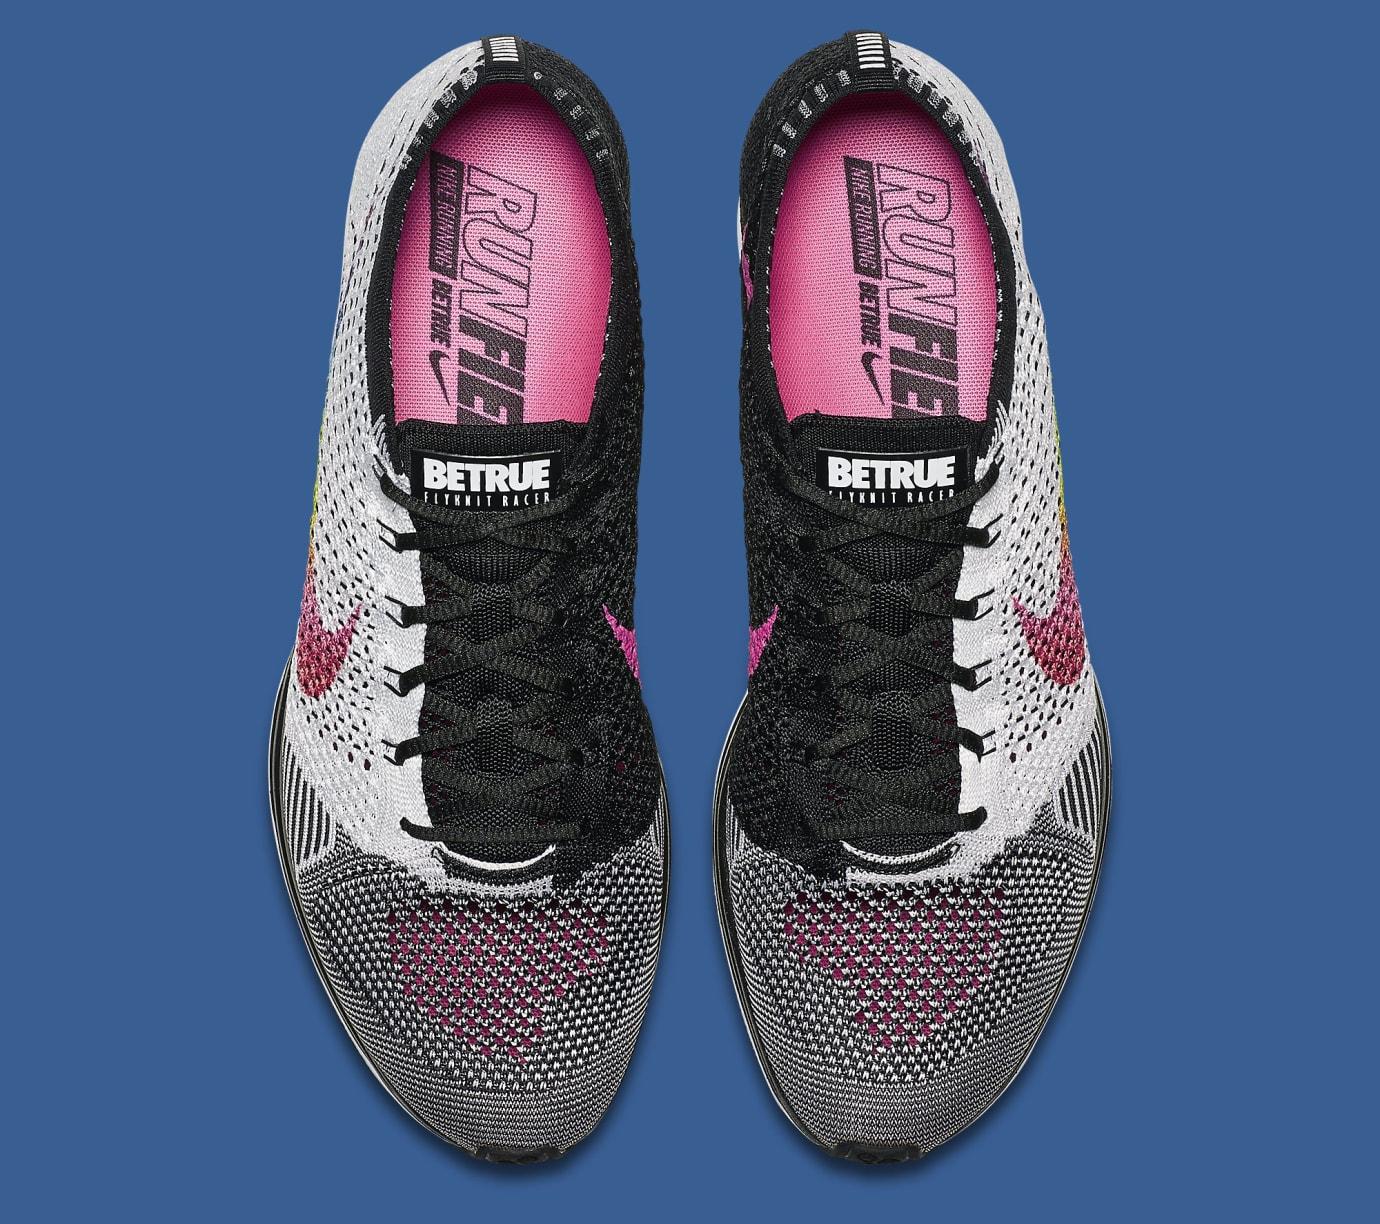 4d172ad879903 Image via Nike Be True Nike Flyknit Racer 902366-100 Top